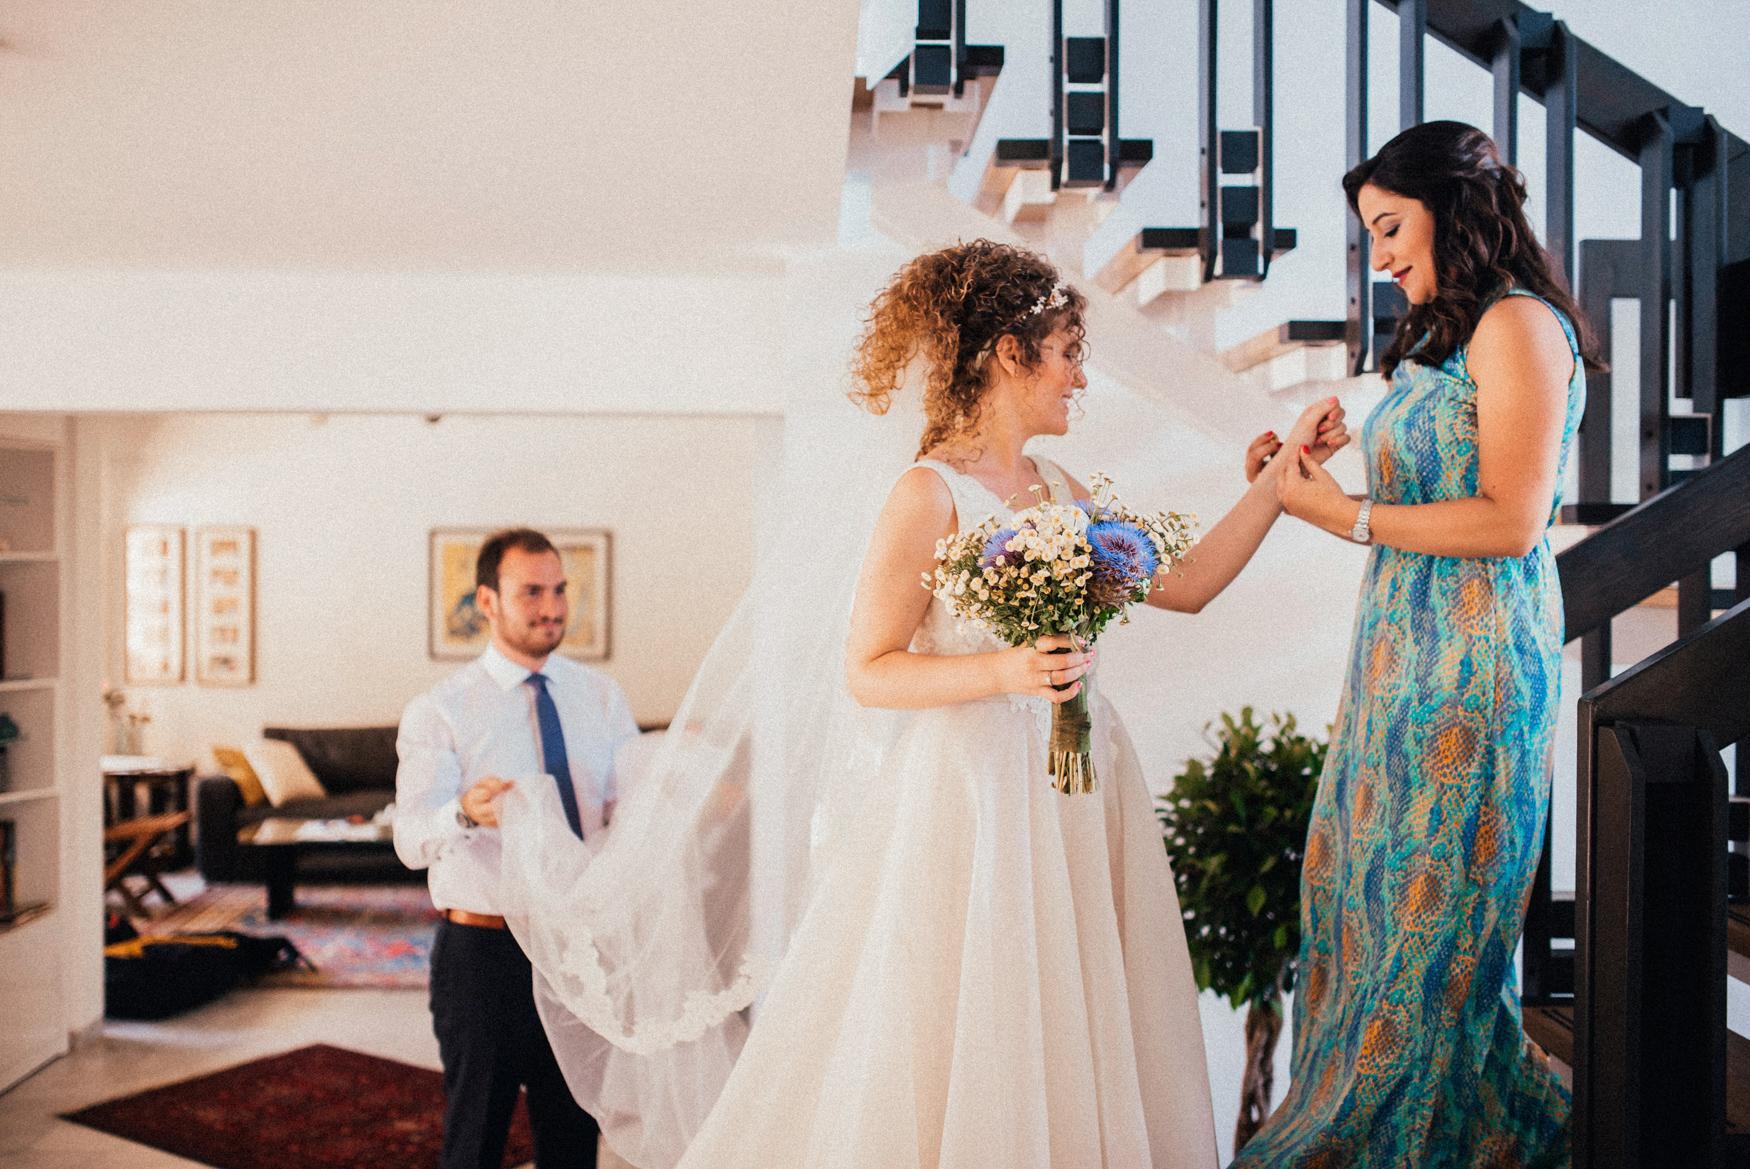 LR2 beirut byblos wedding photographer lebanon 016.jpg